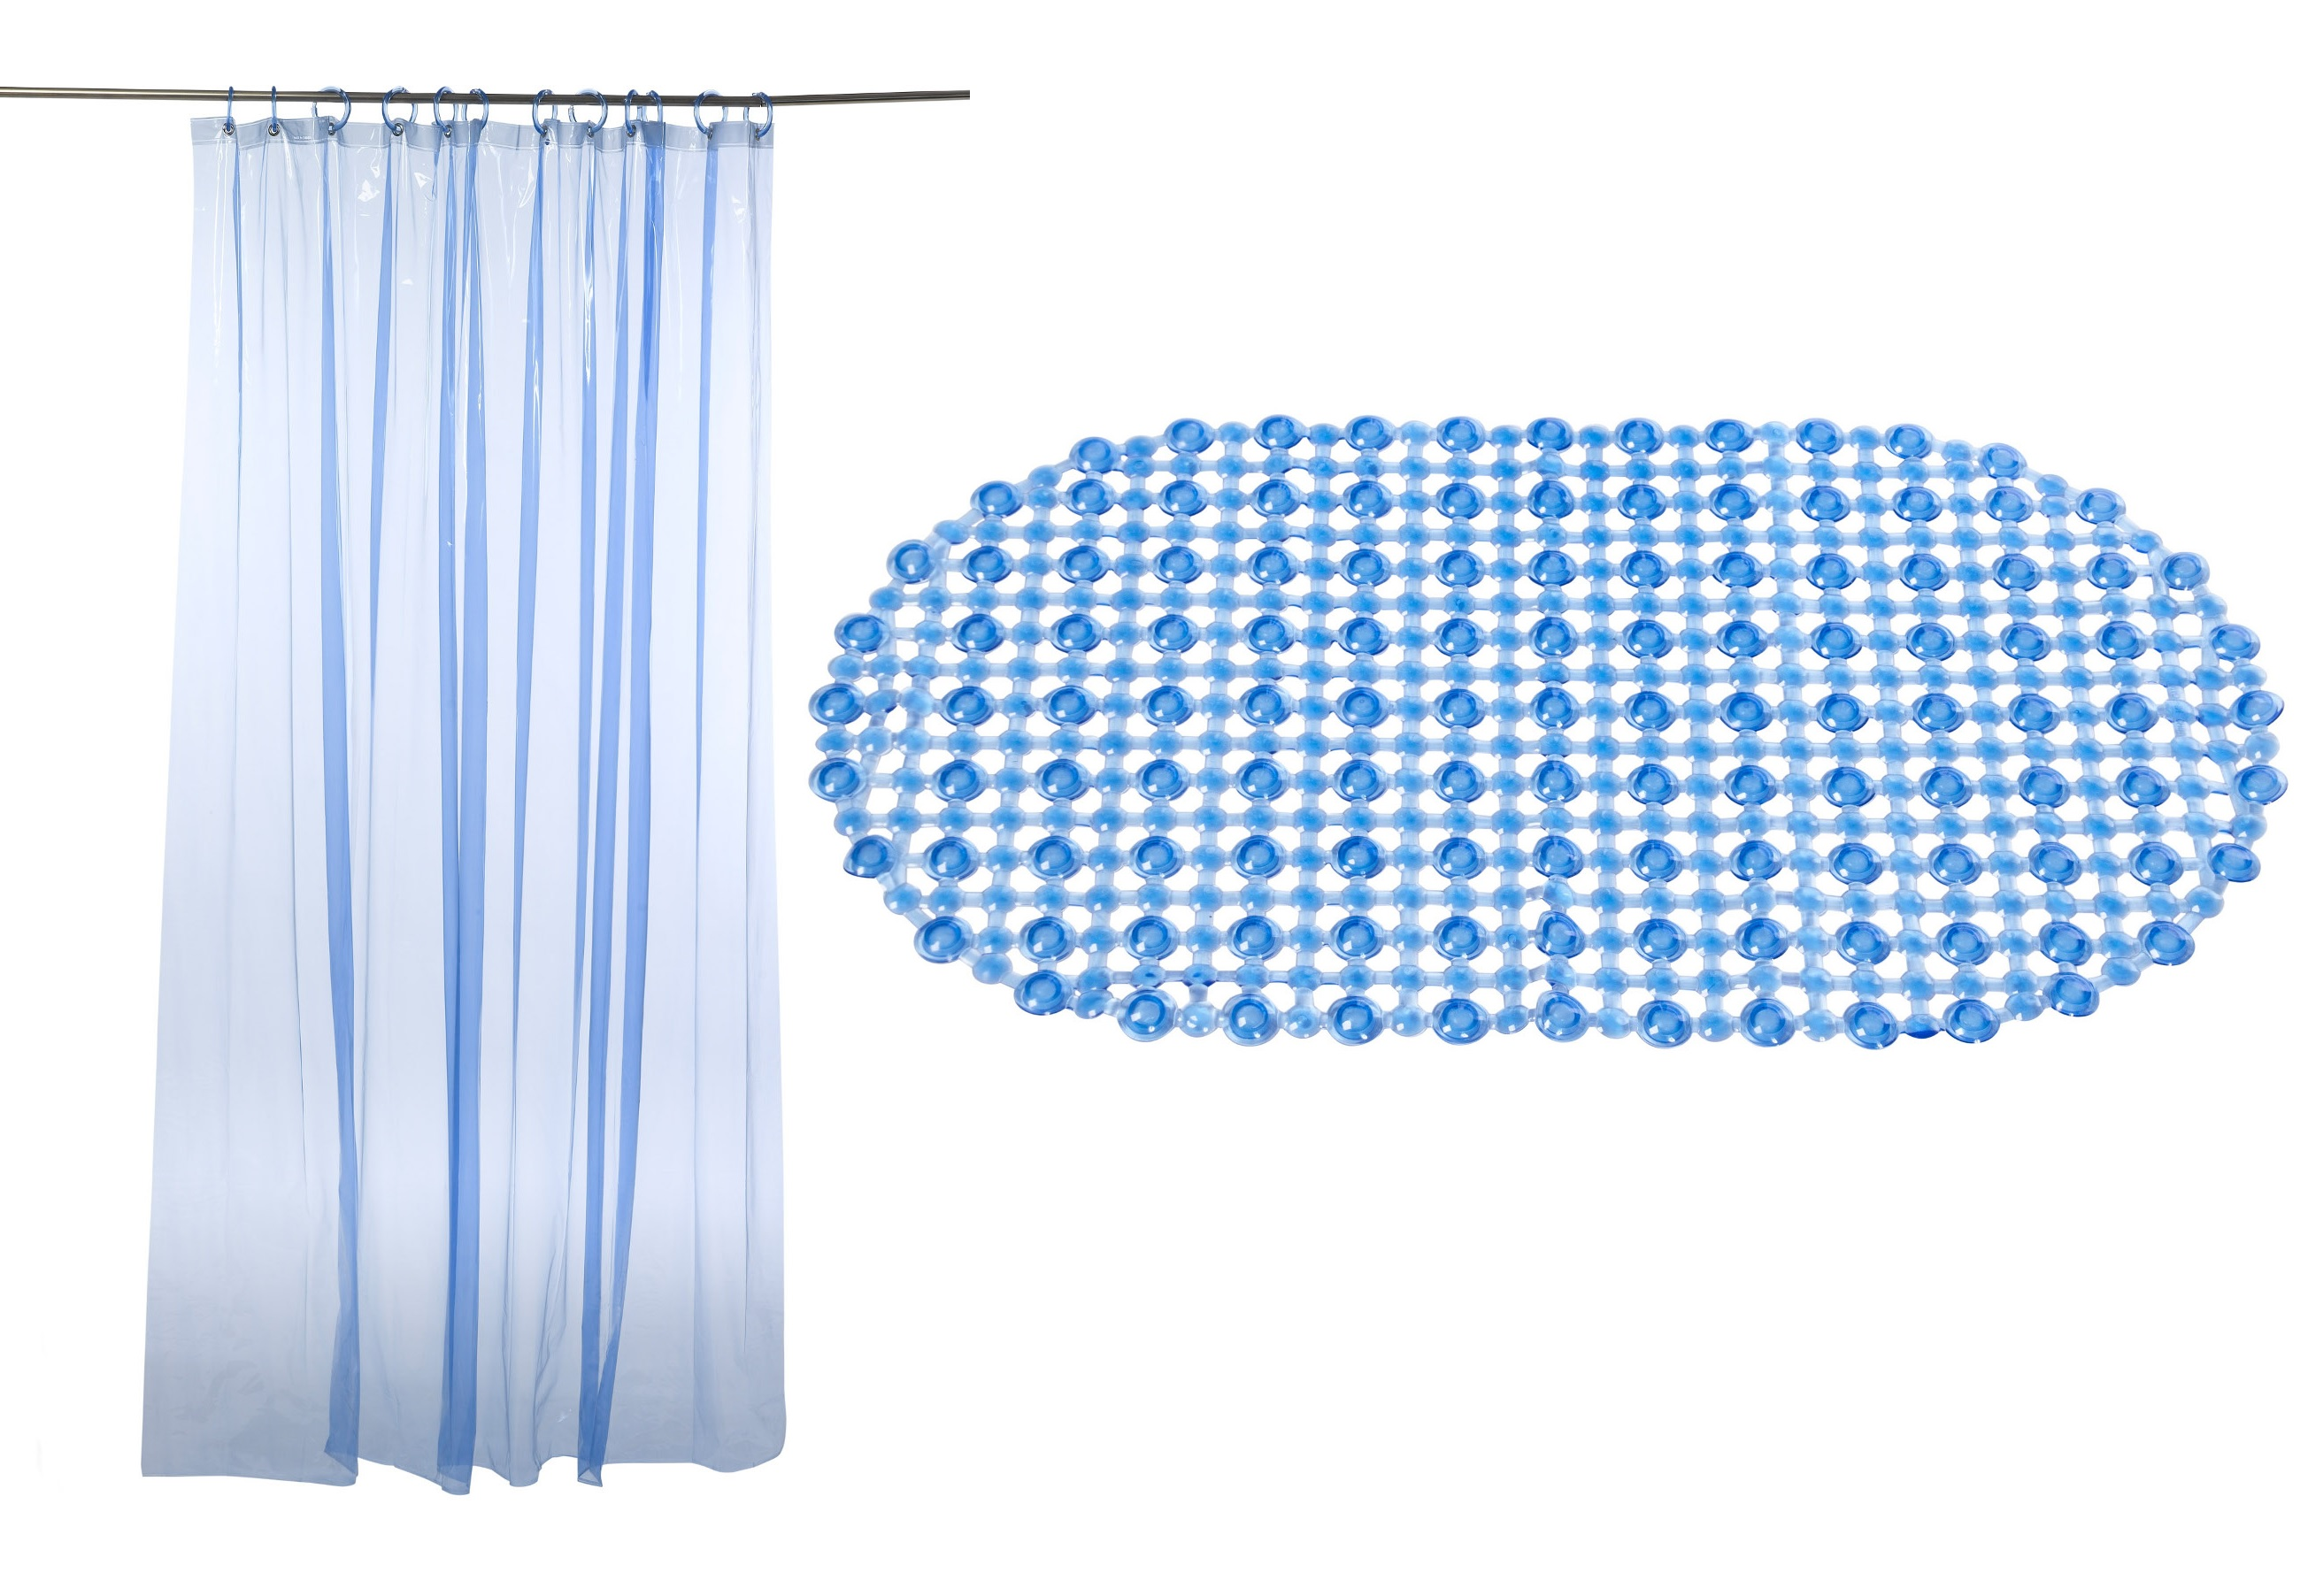 blue bath mat shower curtain set 100 vinyl easy care wipe clean hotel b b ebay. Black Bedroom Furniture Sets. Home Design Ideas